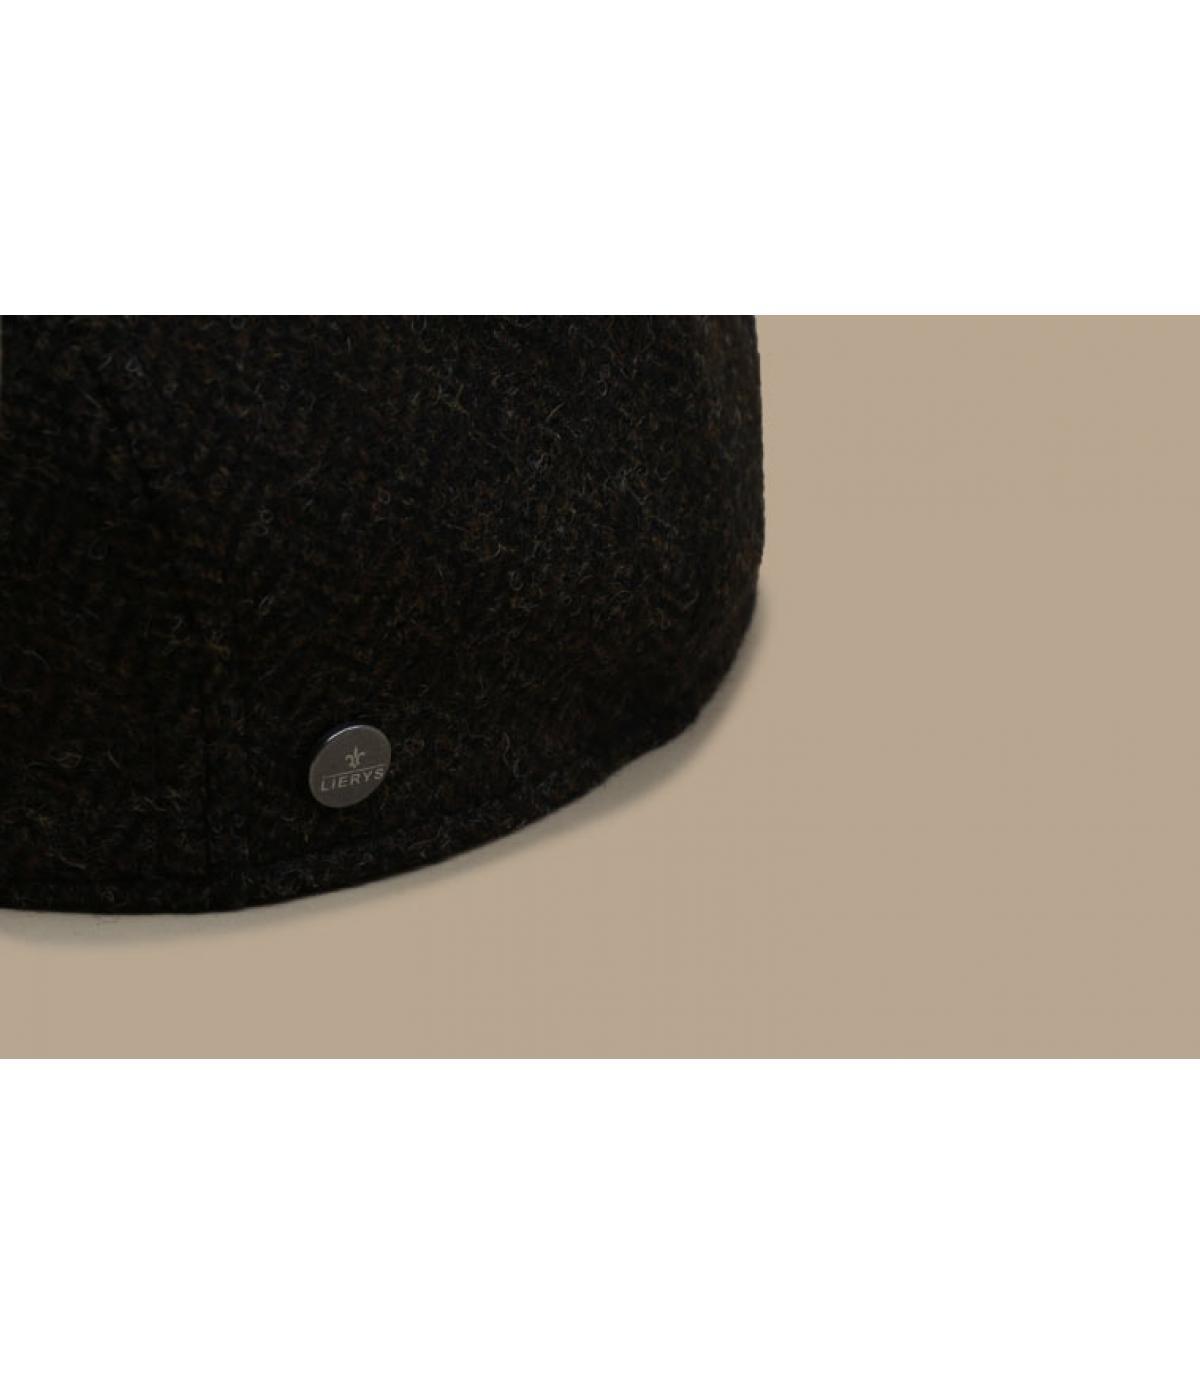 Detalles Britton Wool Herringbone brown imagen 3